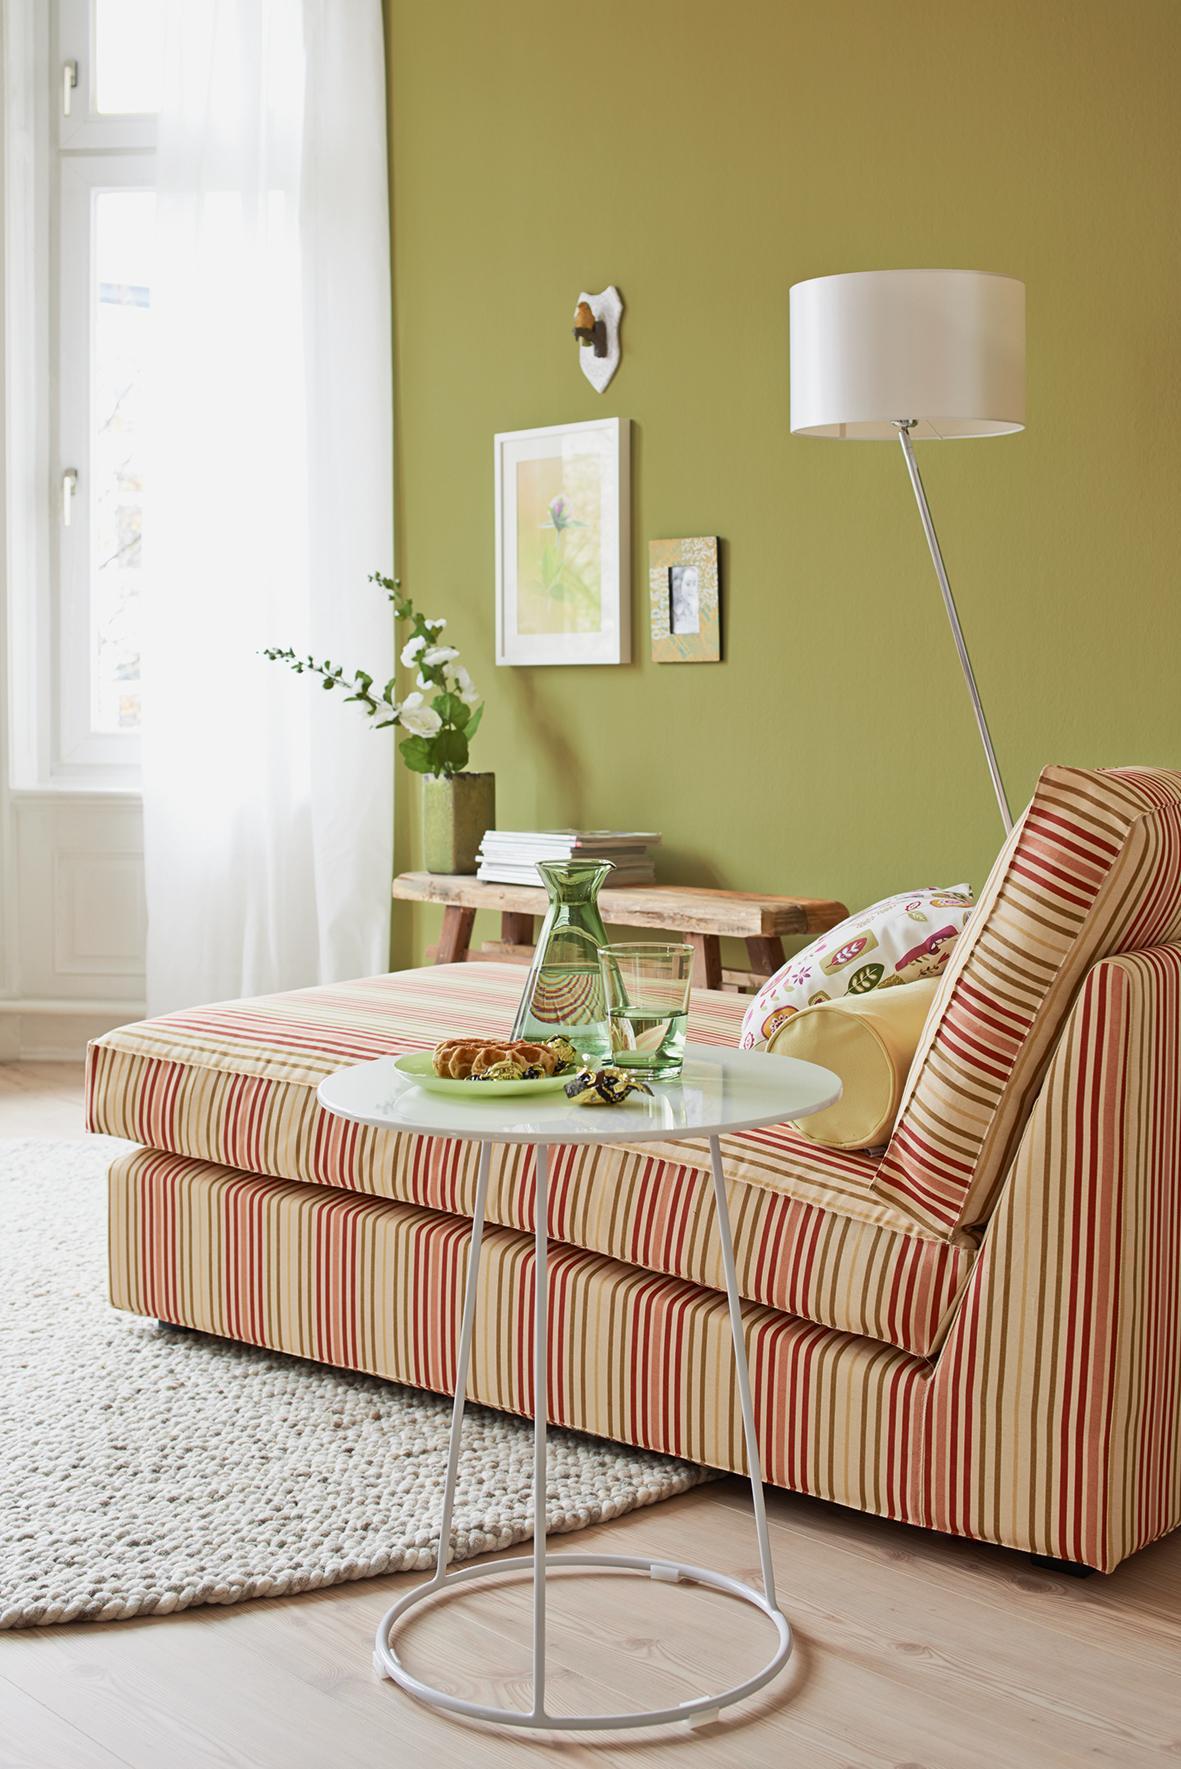 Grüne Wandfarbe Bilder Ideen Couch